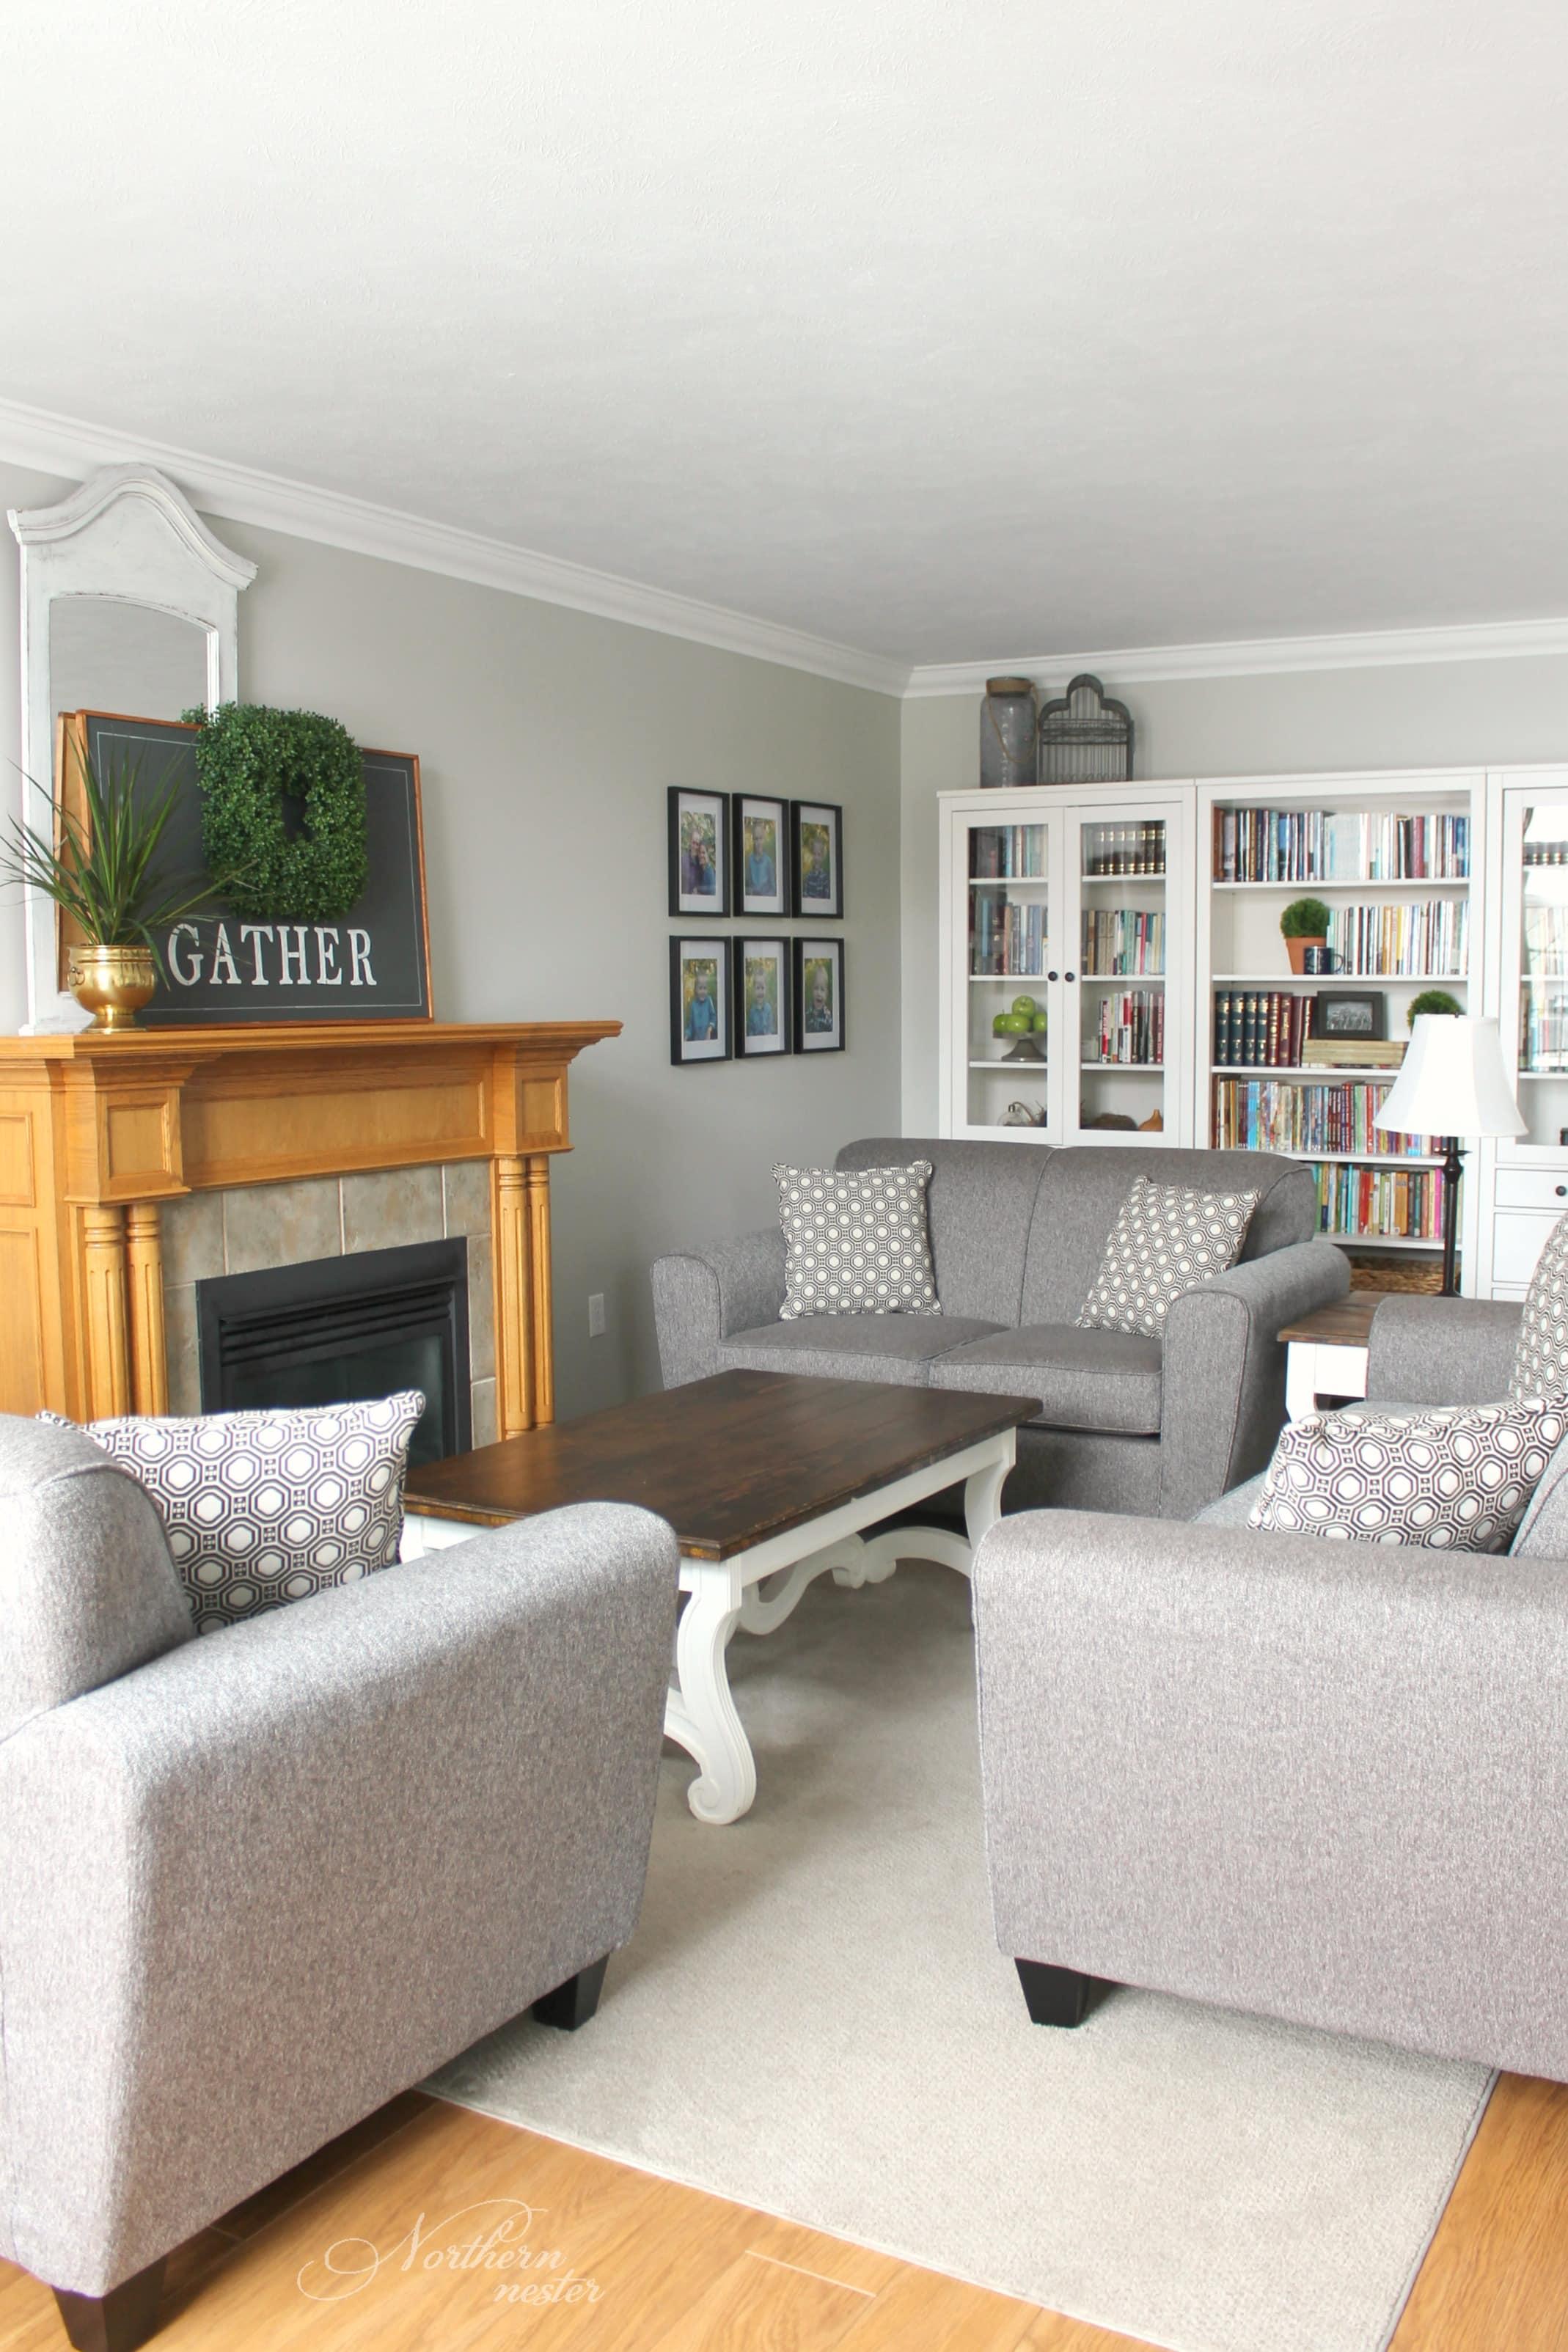 The Uncluttered Homeschool Northern Nester